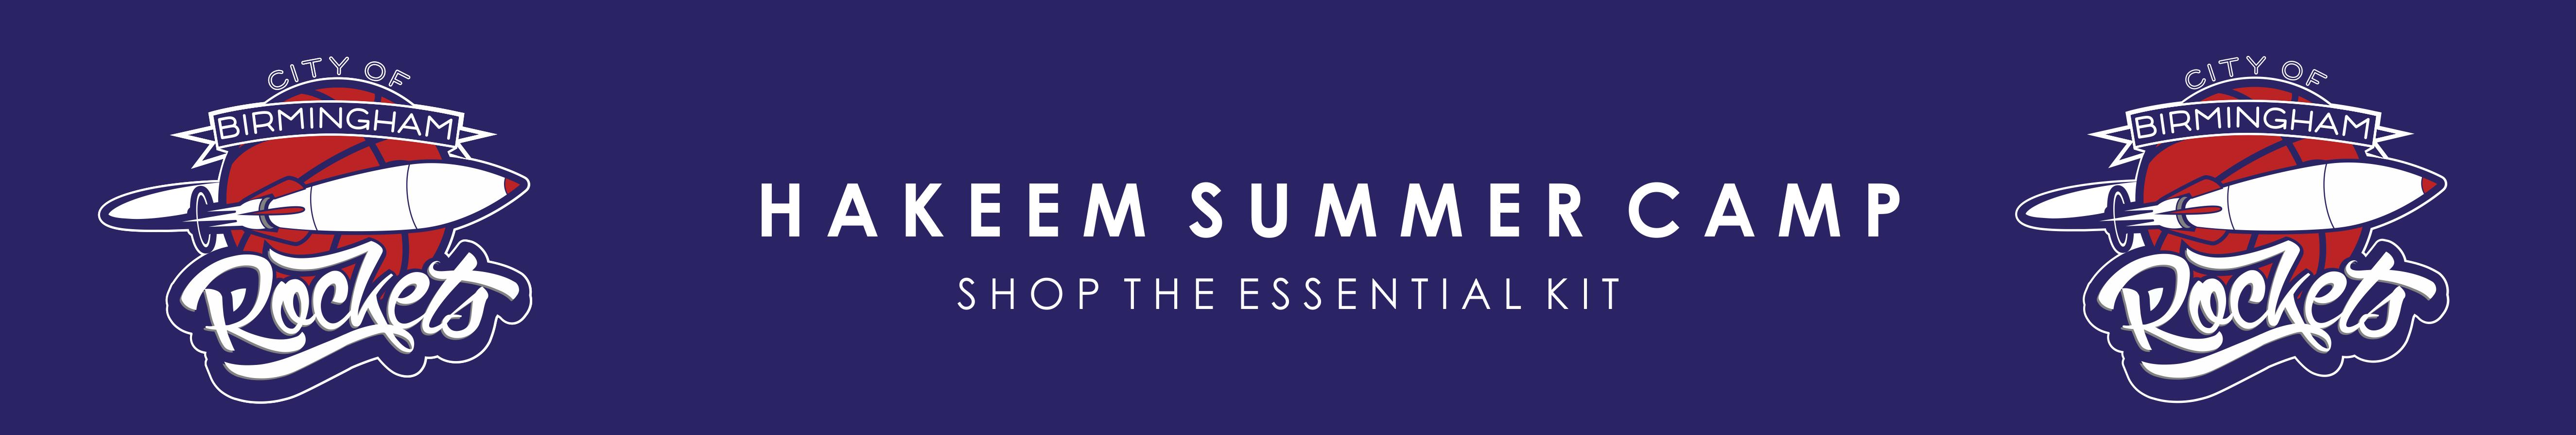 cob-hakeem-summer-camp-banner.png